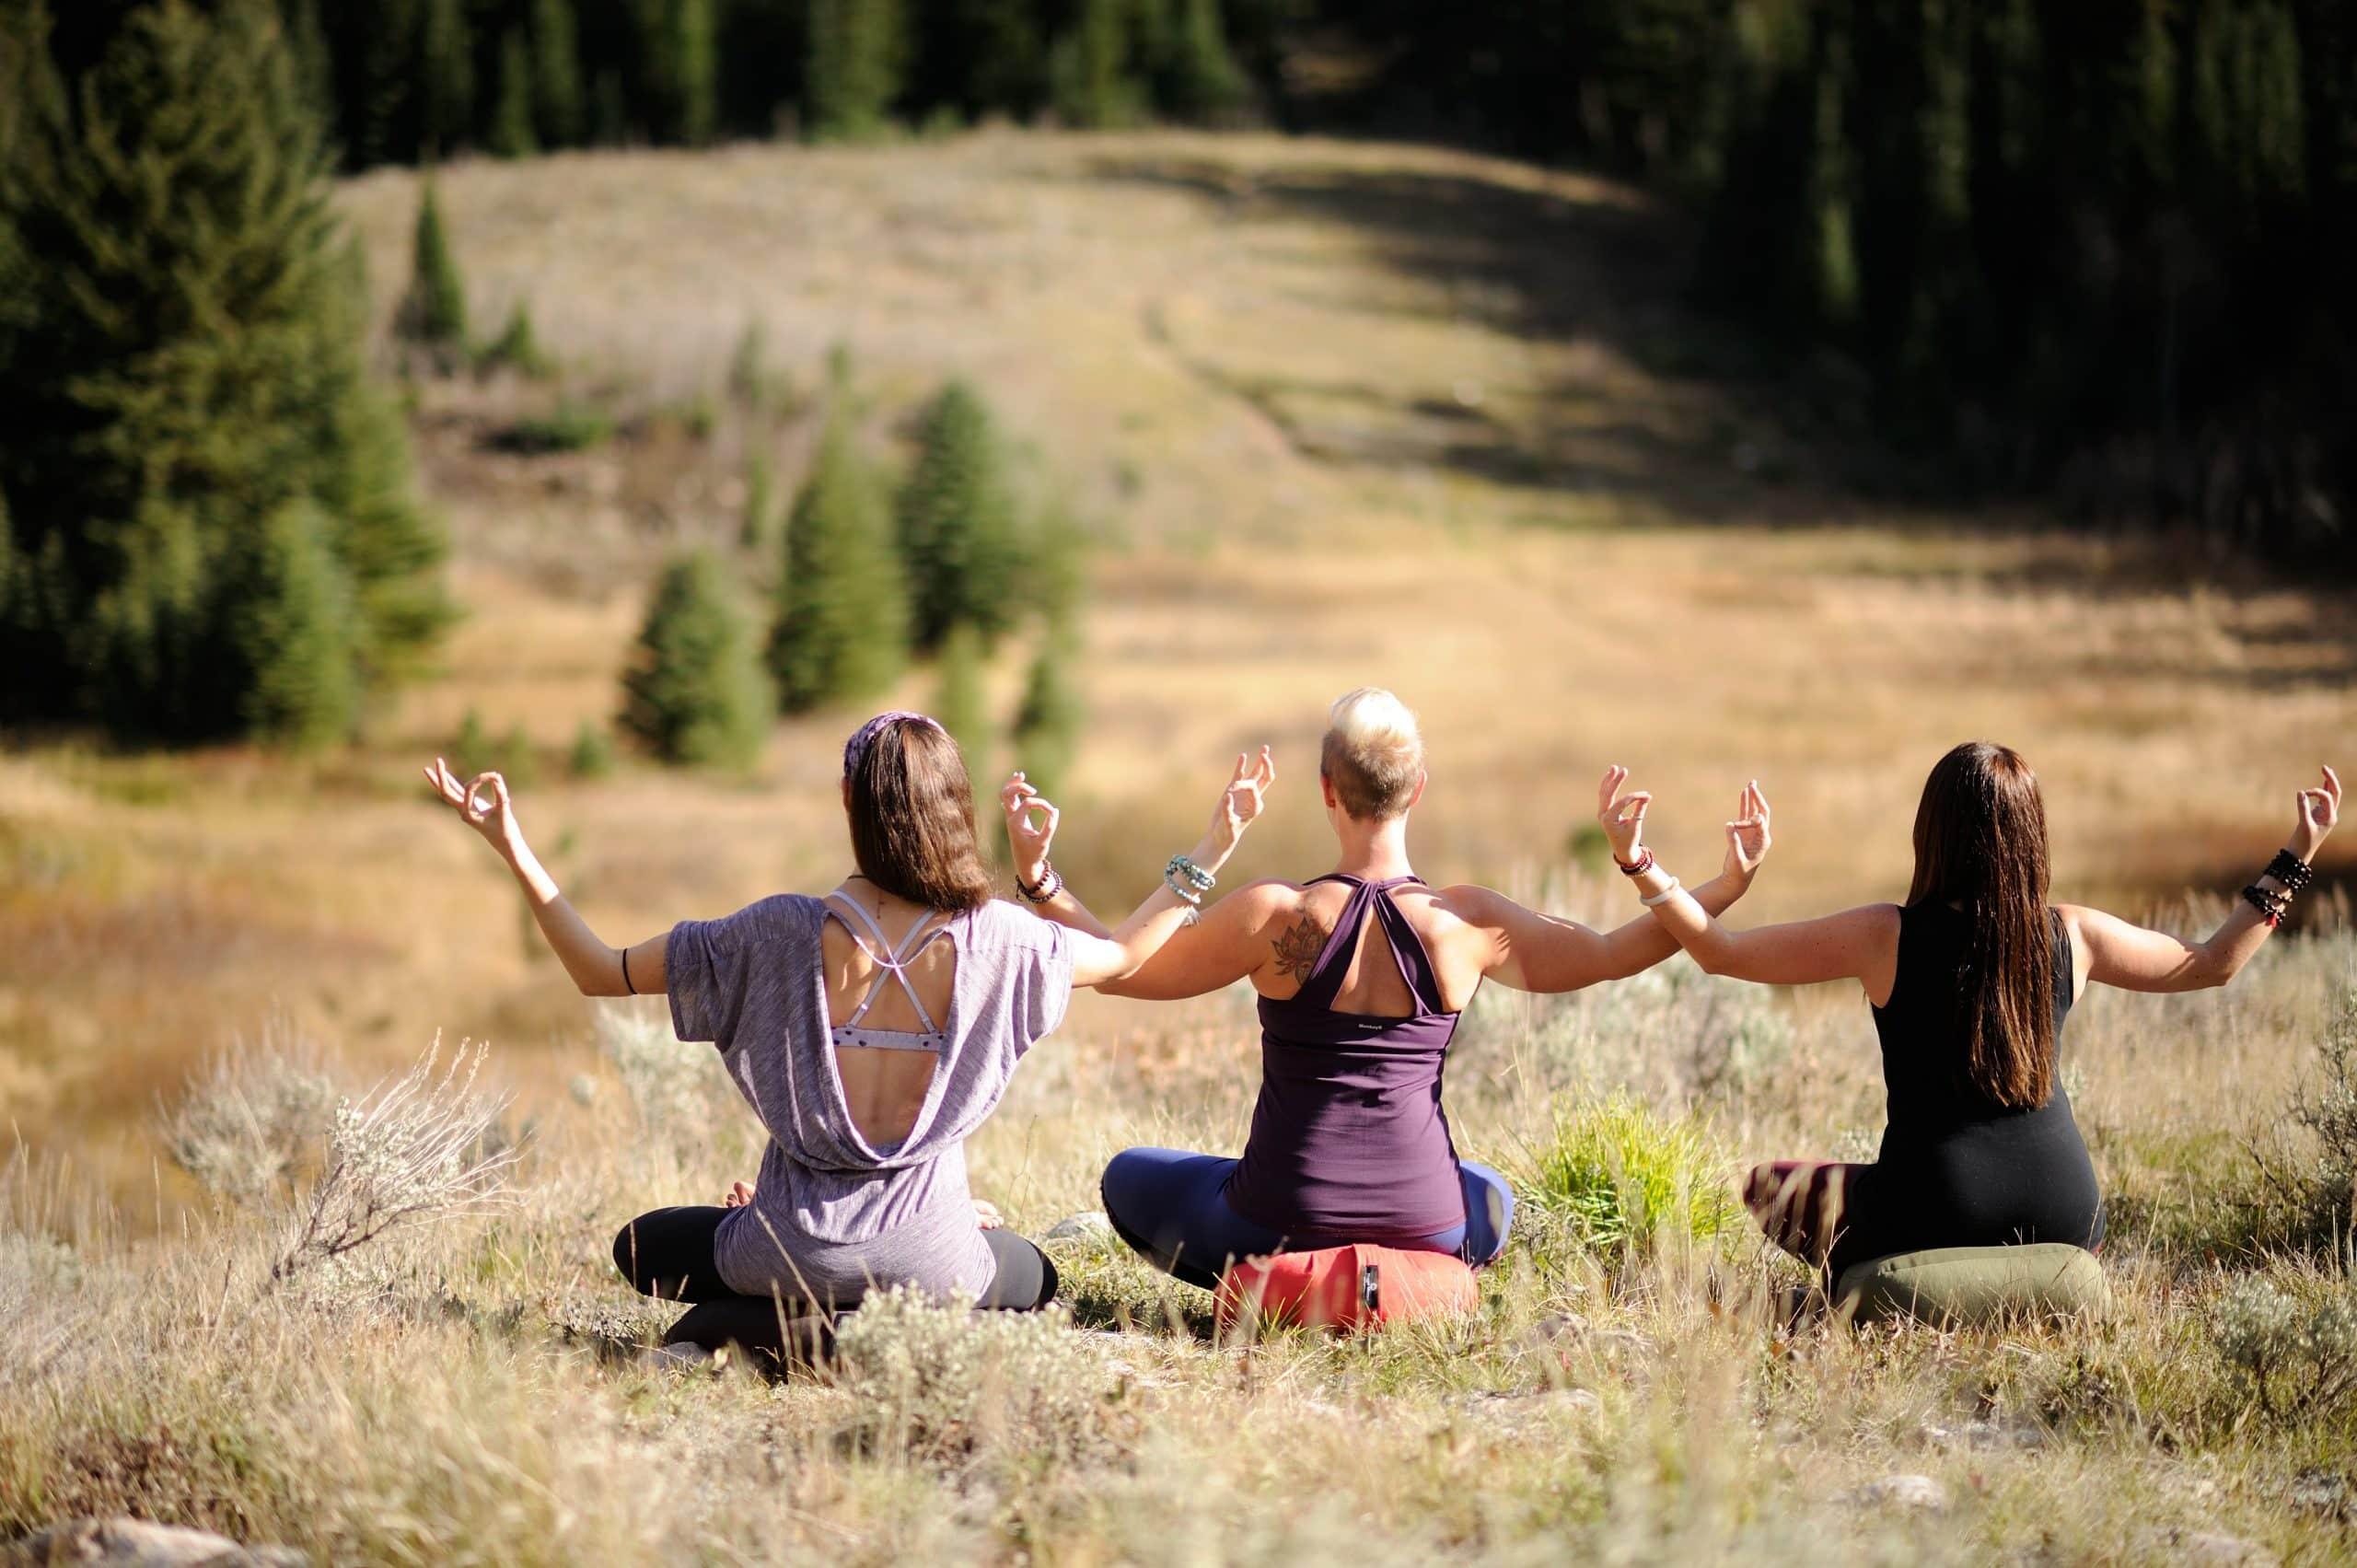 drie vrouwen in meditatiehouding